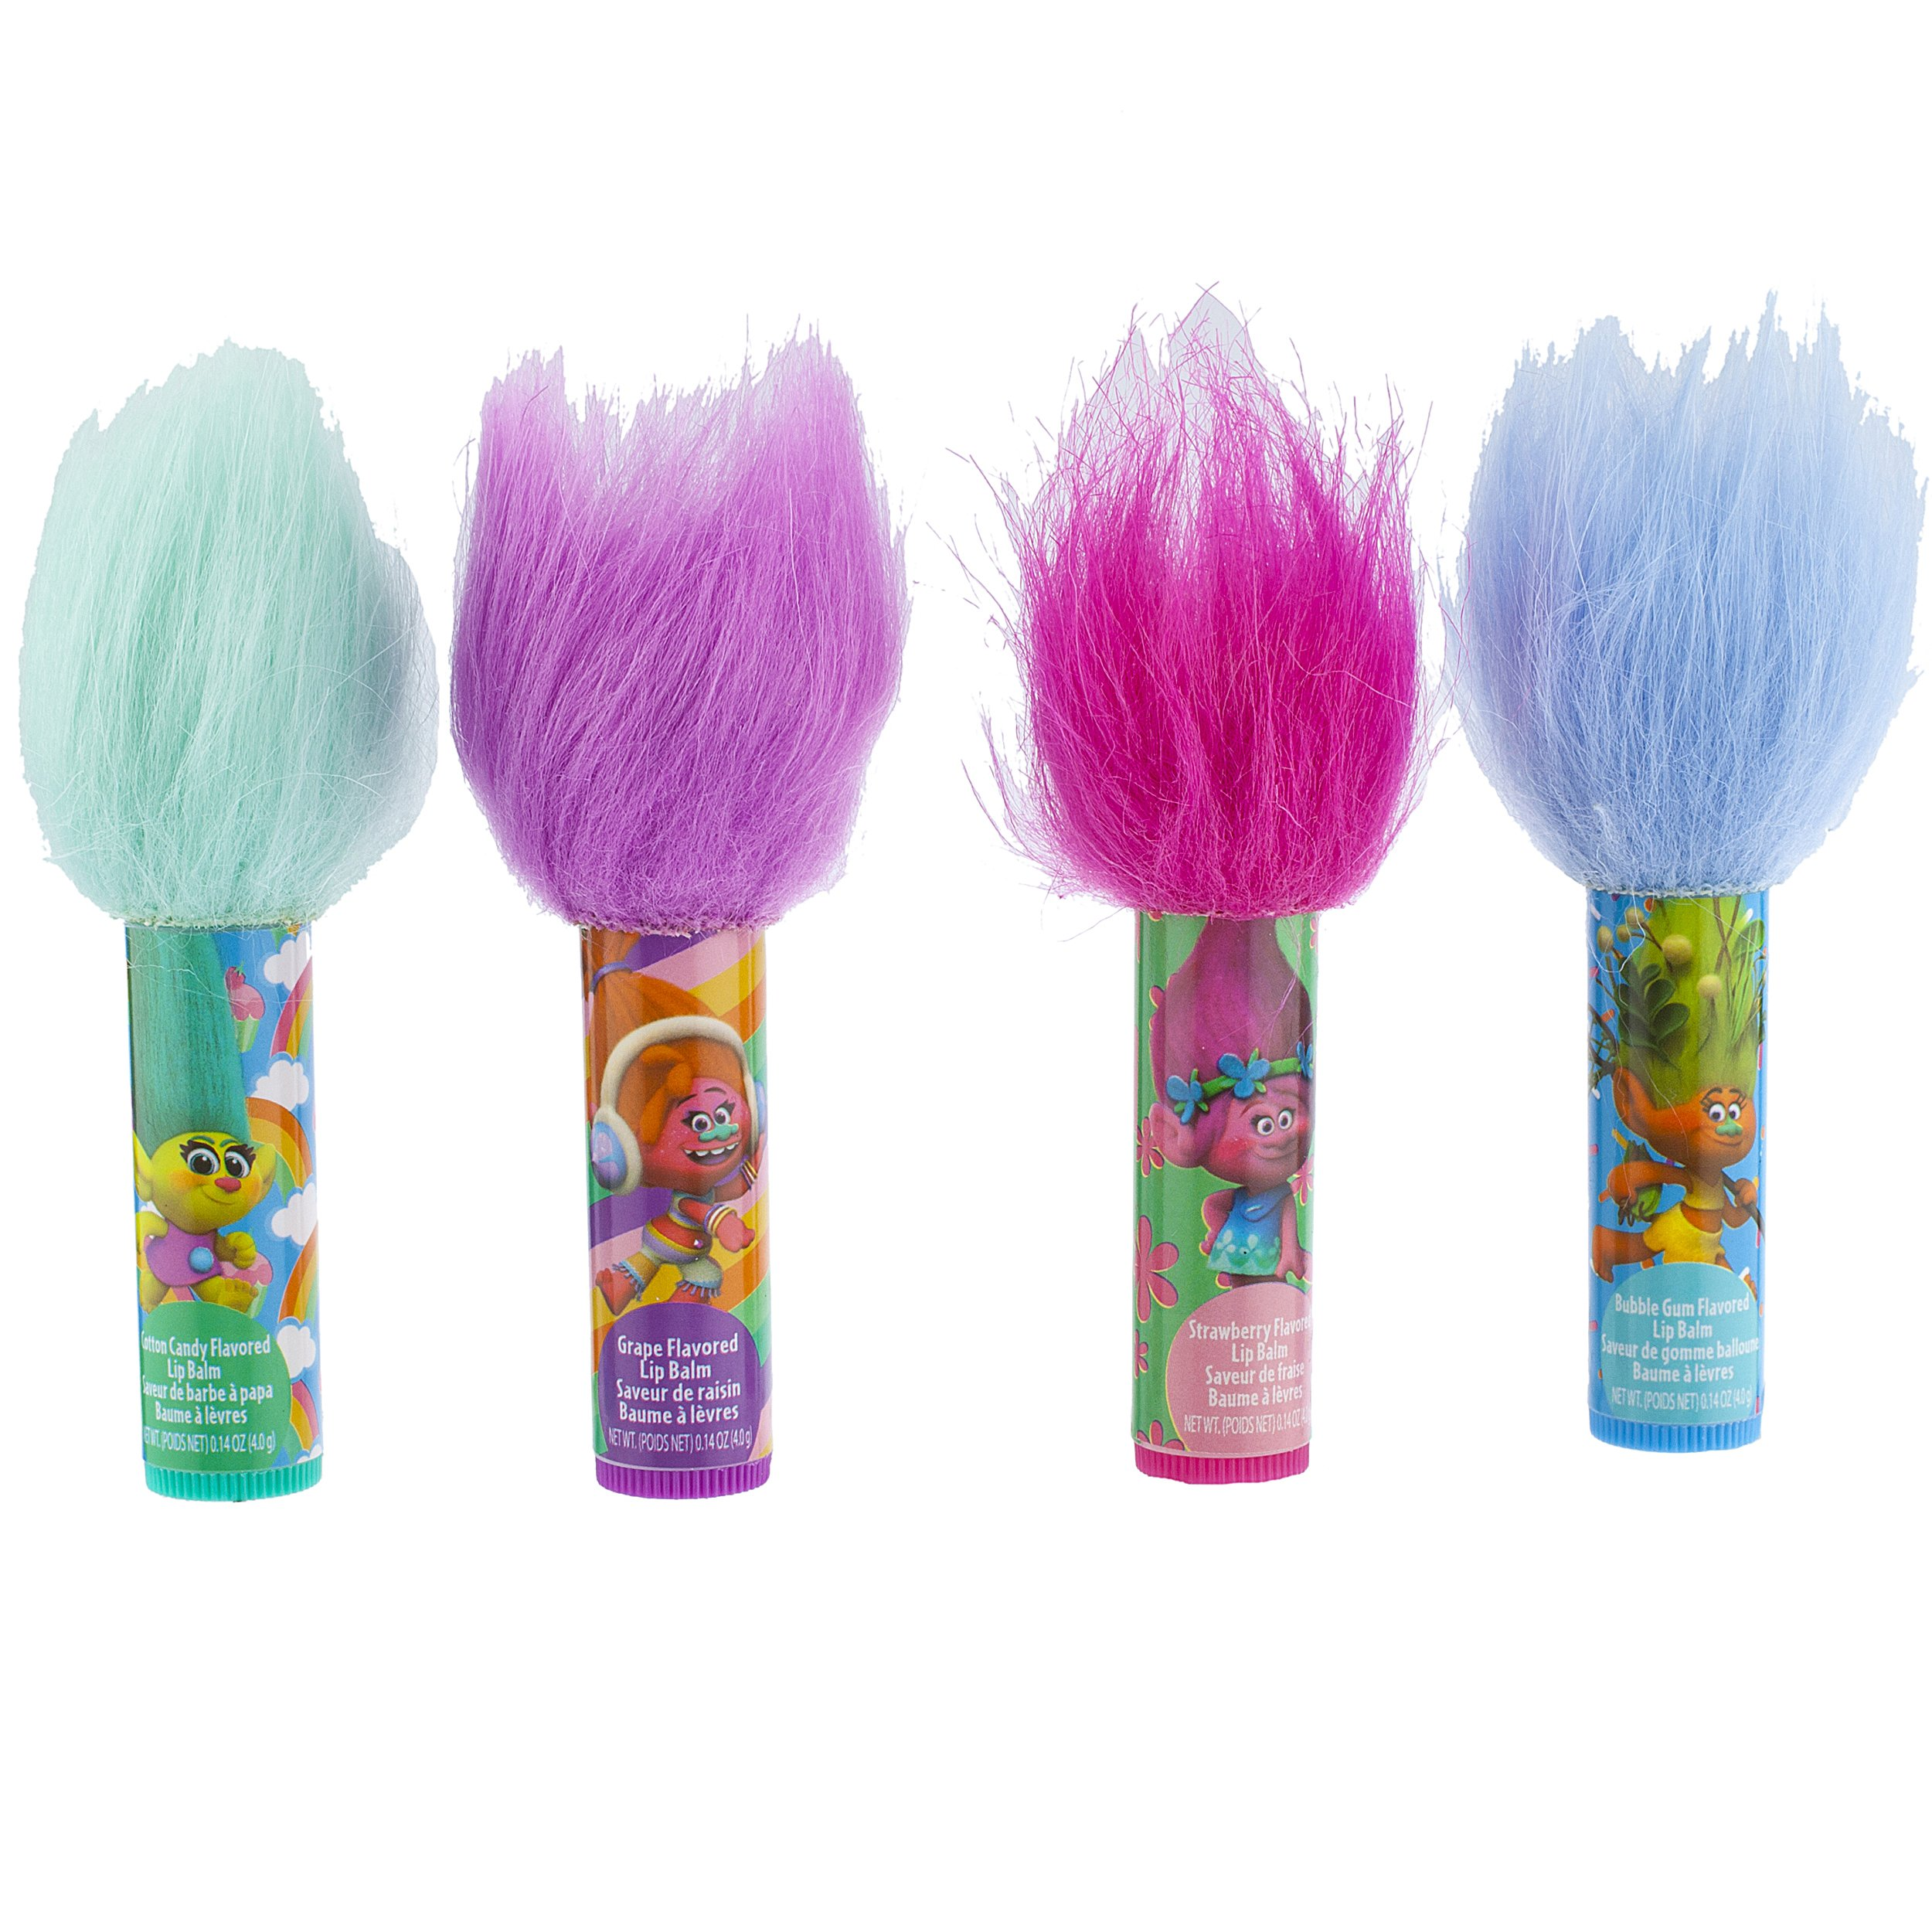 Townley Girl Disney Princess Non Toxic Peel Off Nail: Townley Girl Dreamworks Trolls Non-Toxic Peel-Off Nail